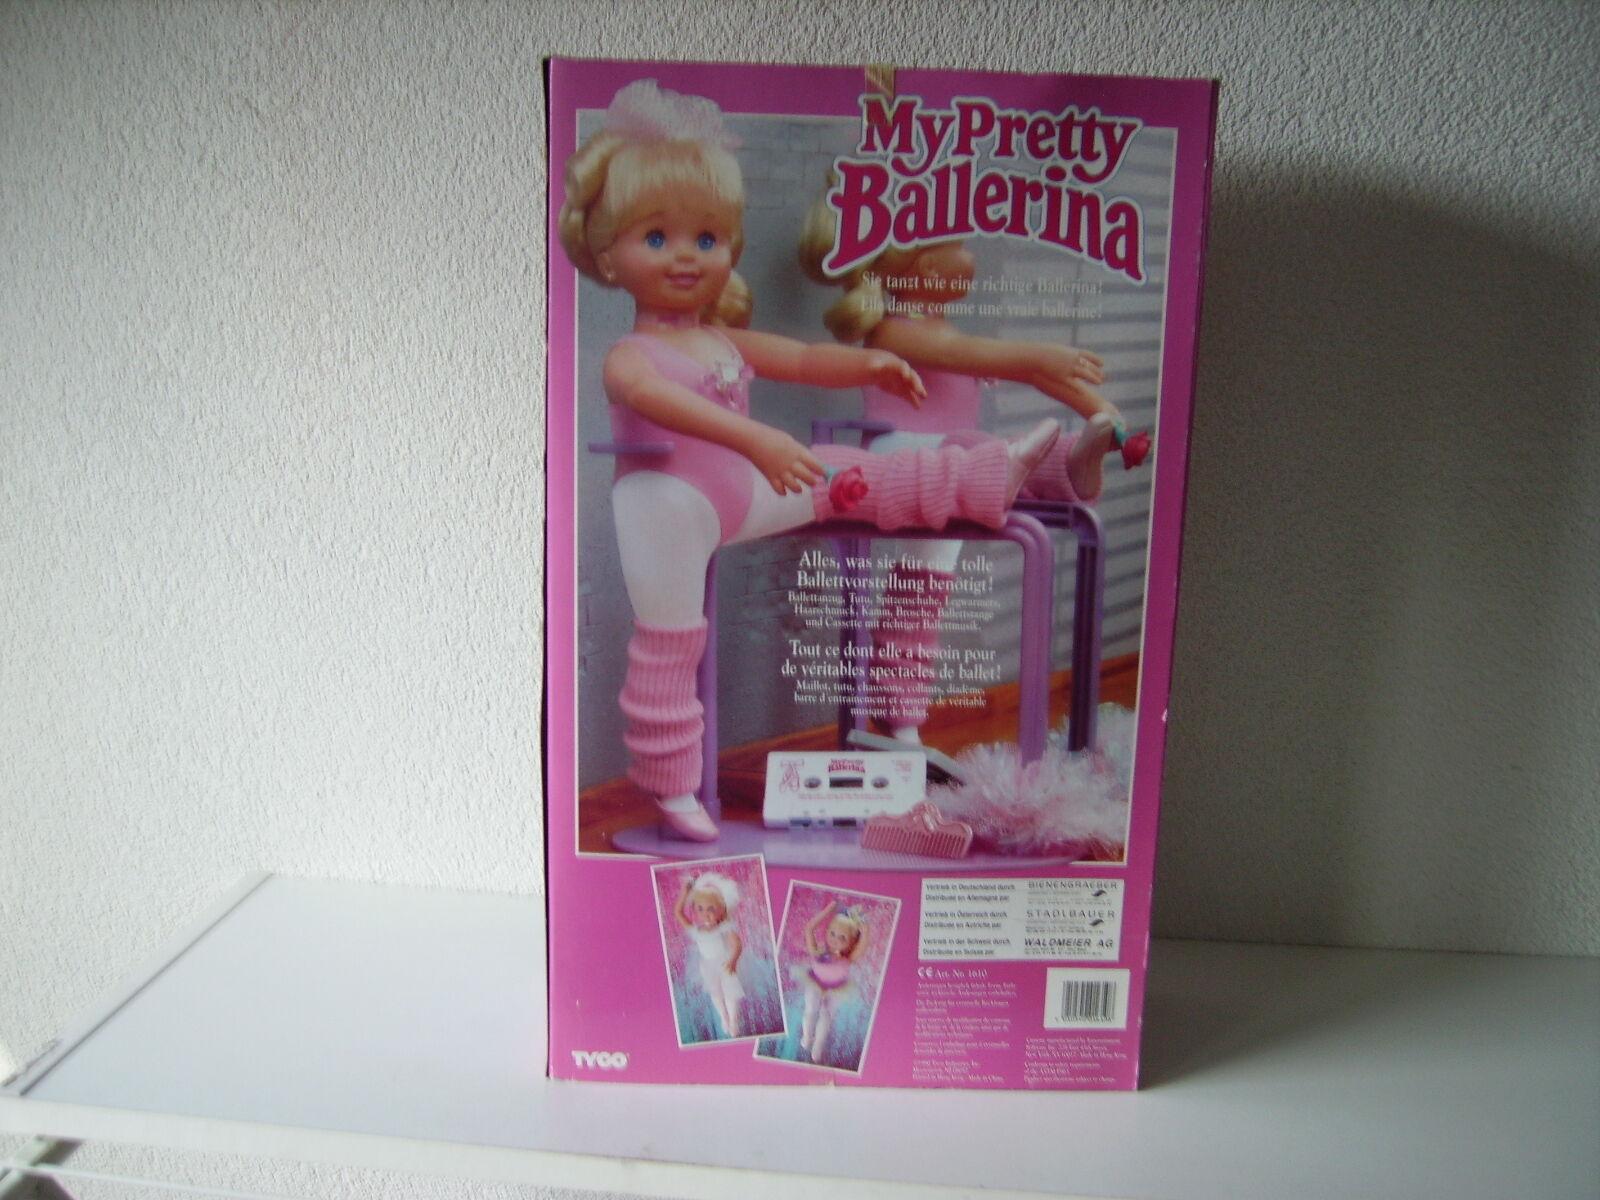 Pop van Tyco MyPretty Ballerina